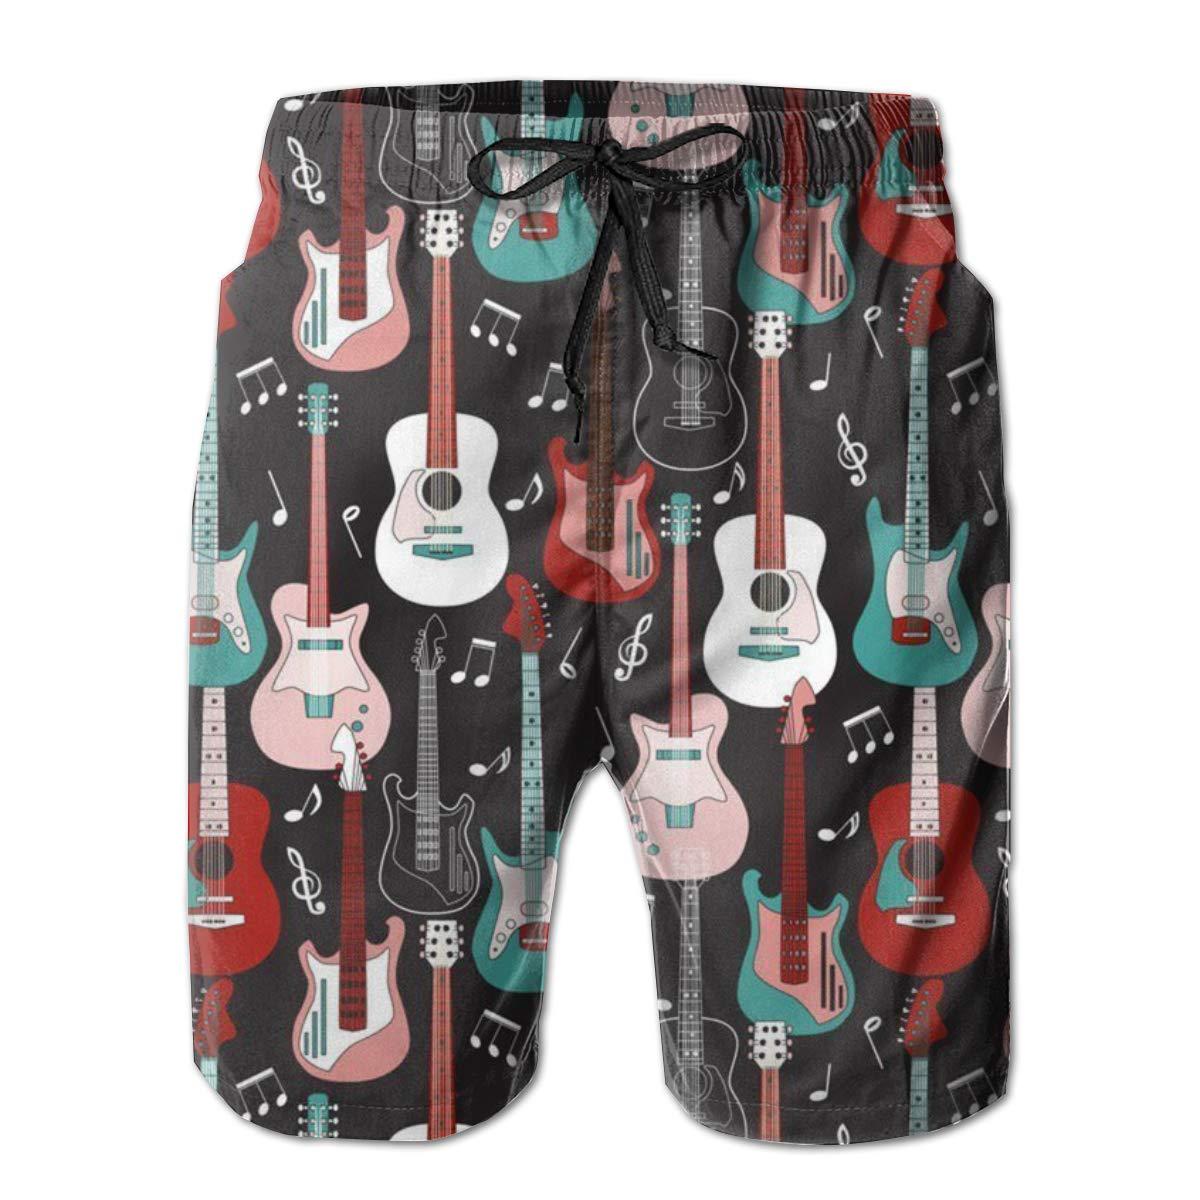 Men's Casual Novelty Board Shorts - Rock and Roll Guitars Beach Wear Shorts - Side Pocket & Elastic Waist Drawstring Running Swimsuit - No Mesh Lining